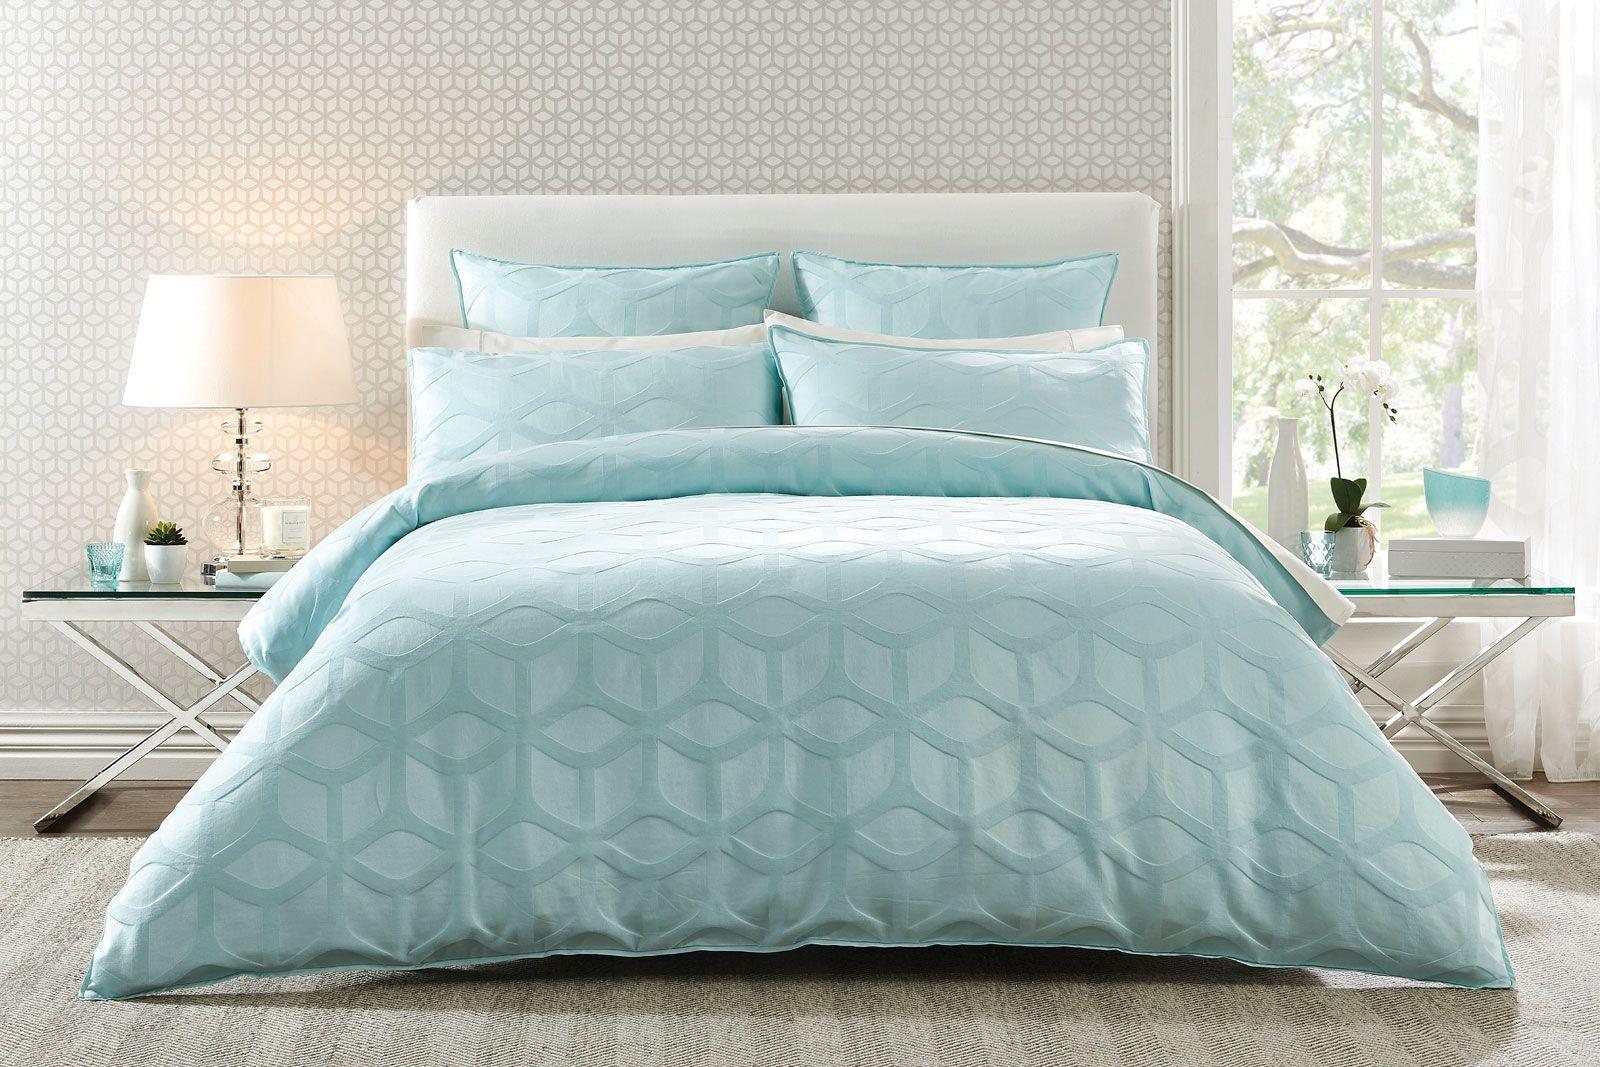 Best Trellis Bed Bath N Table Diy Girls Bedroom Quilt Cover 400 x 300